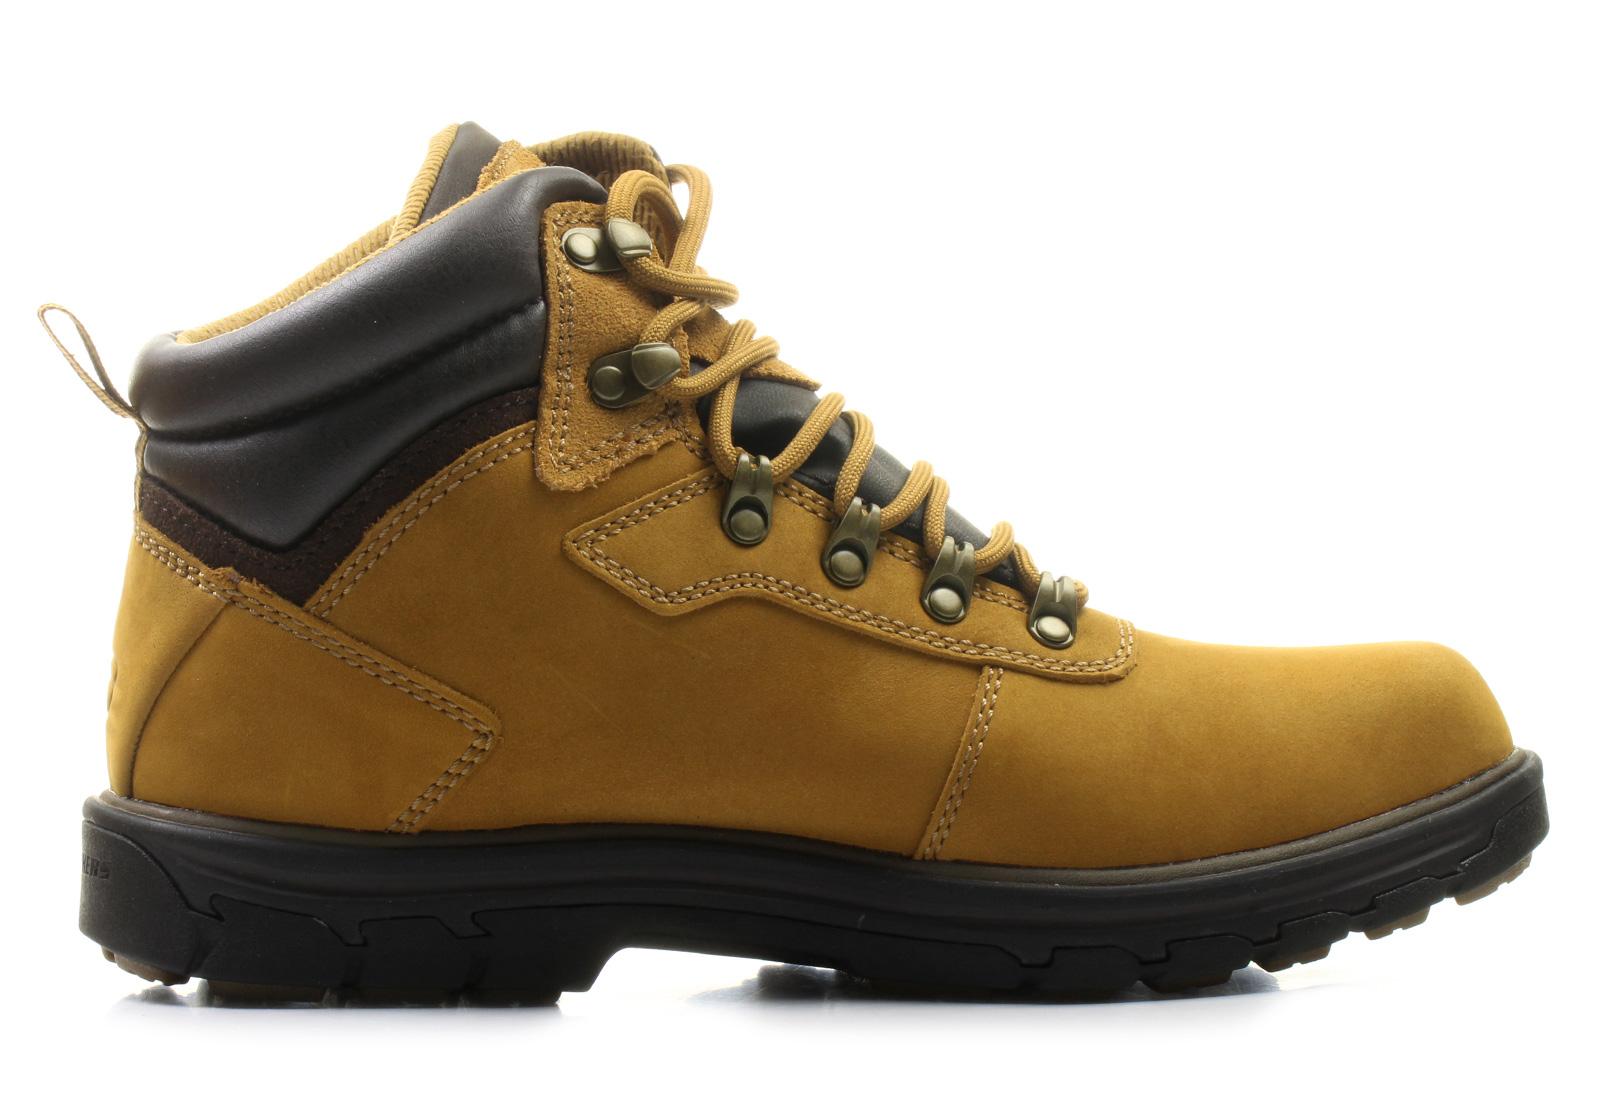 uusi korkea todella söpö ostaa verkosta Skechers Boots - Segment- Ander - 64521-wtn - Online shop for sneakers,  shoes and boots